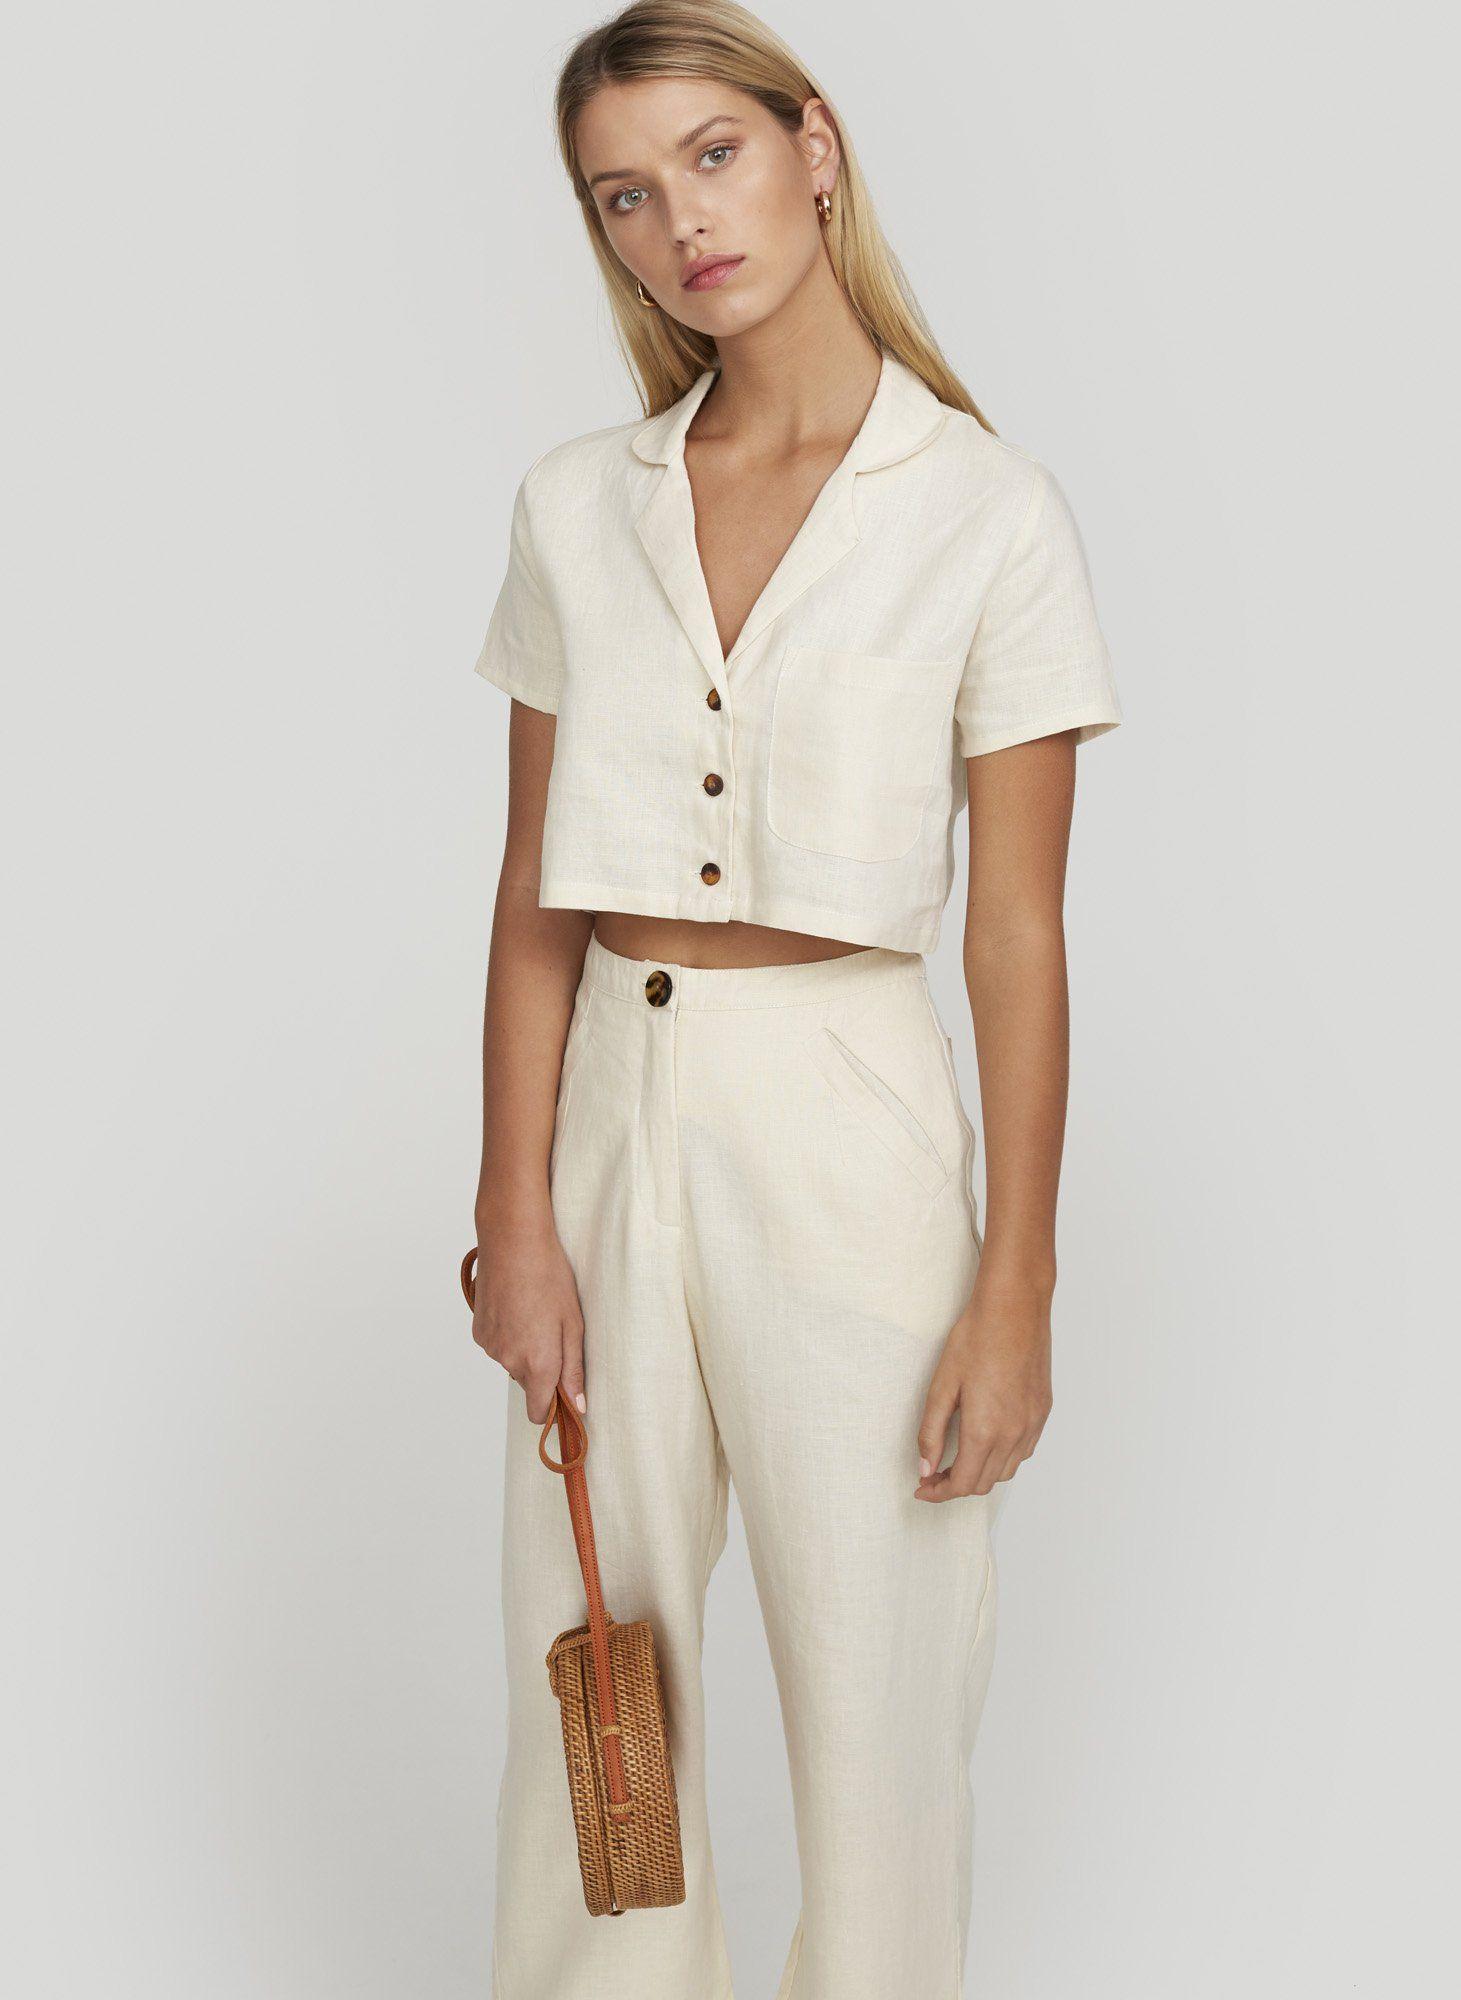 d3c25c8f93 Plain cream - uma shirt in 2019   Style   Shirts, Faithfull the ...